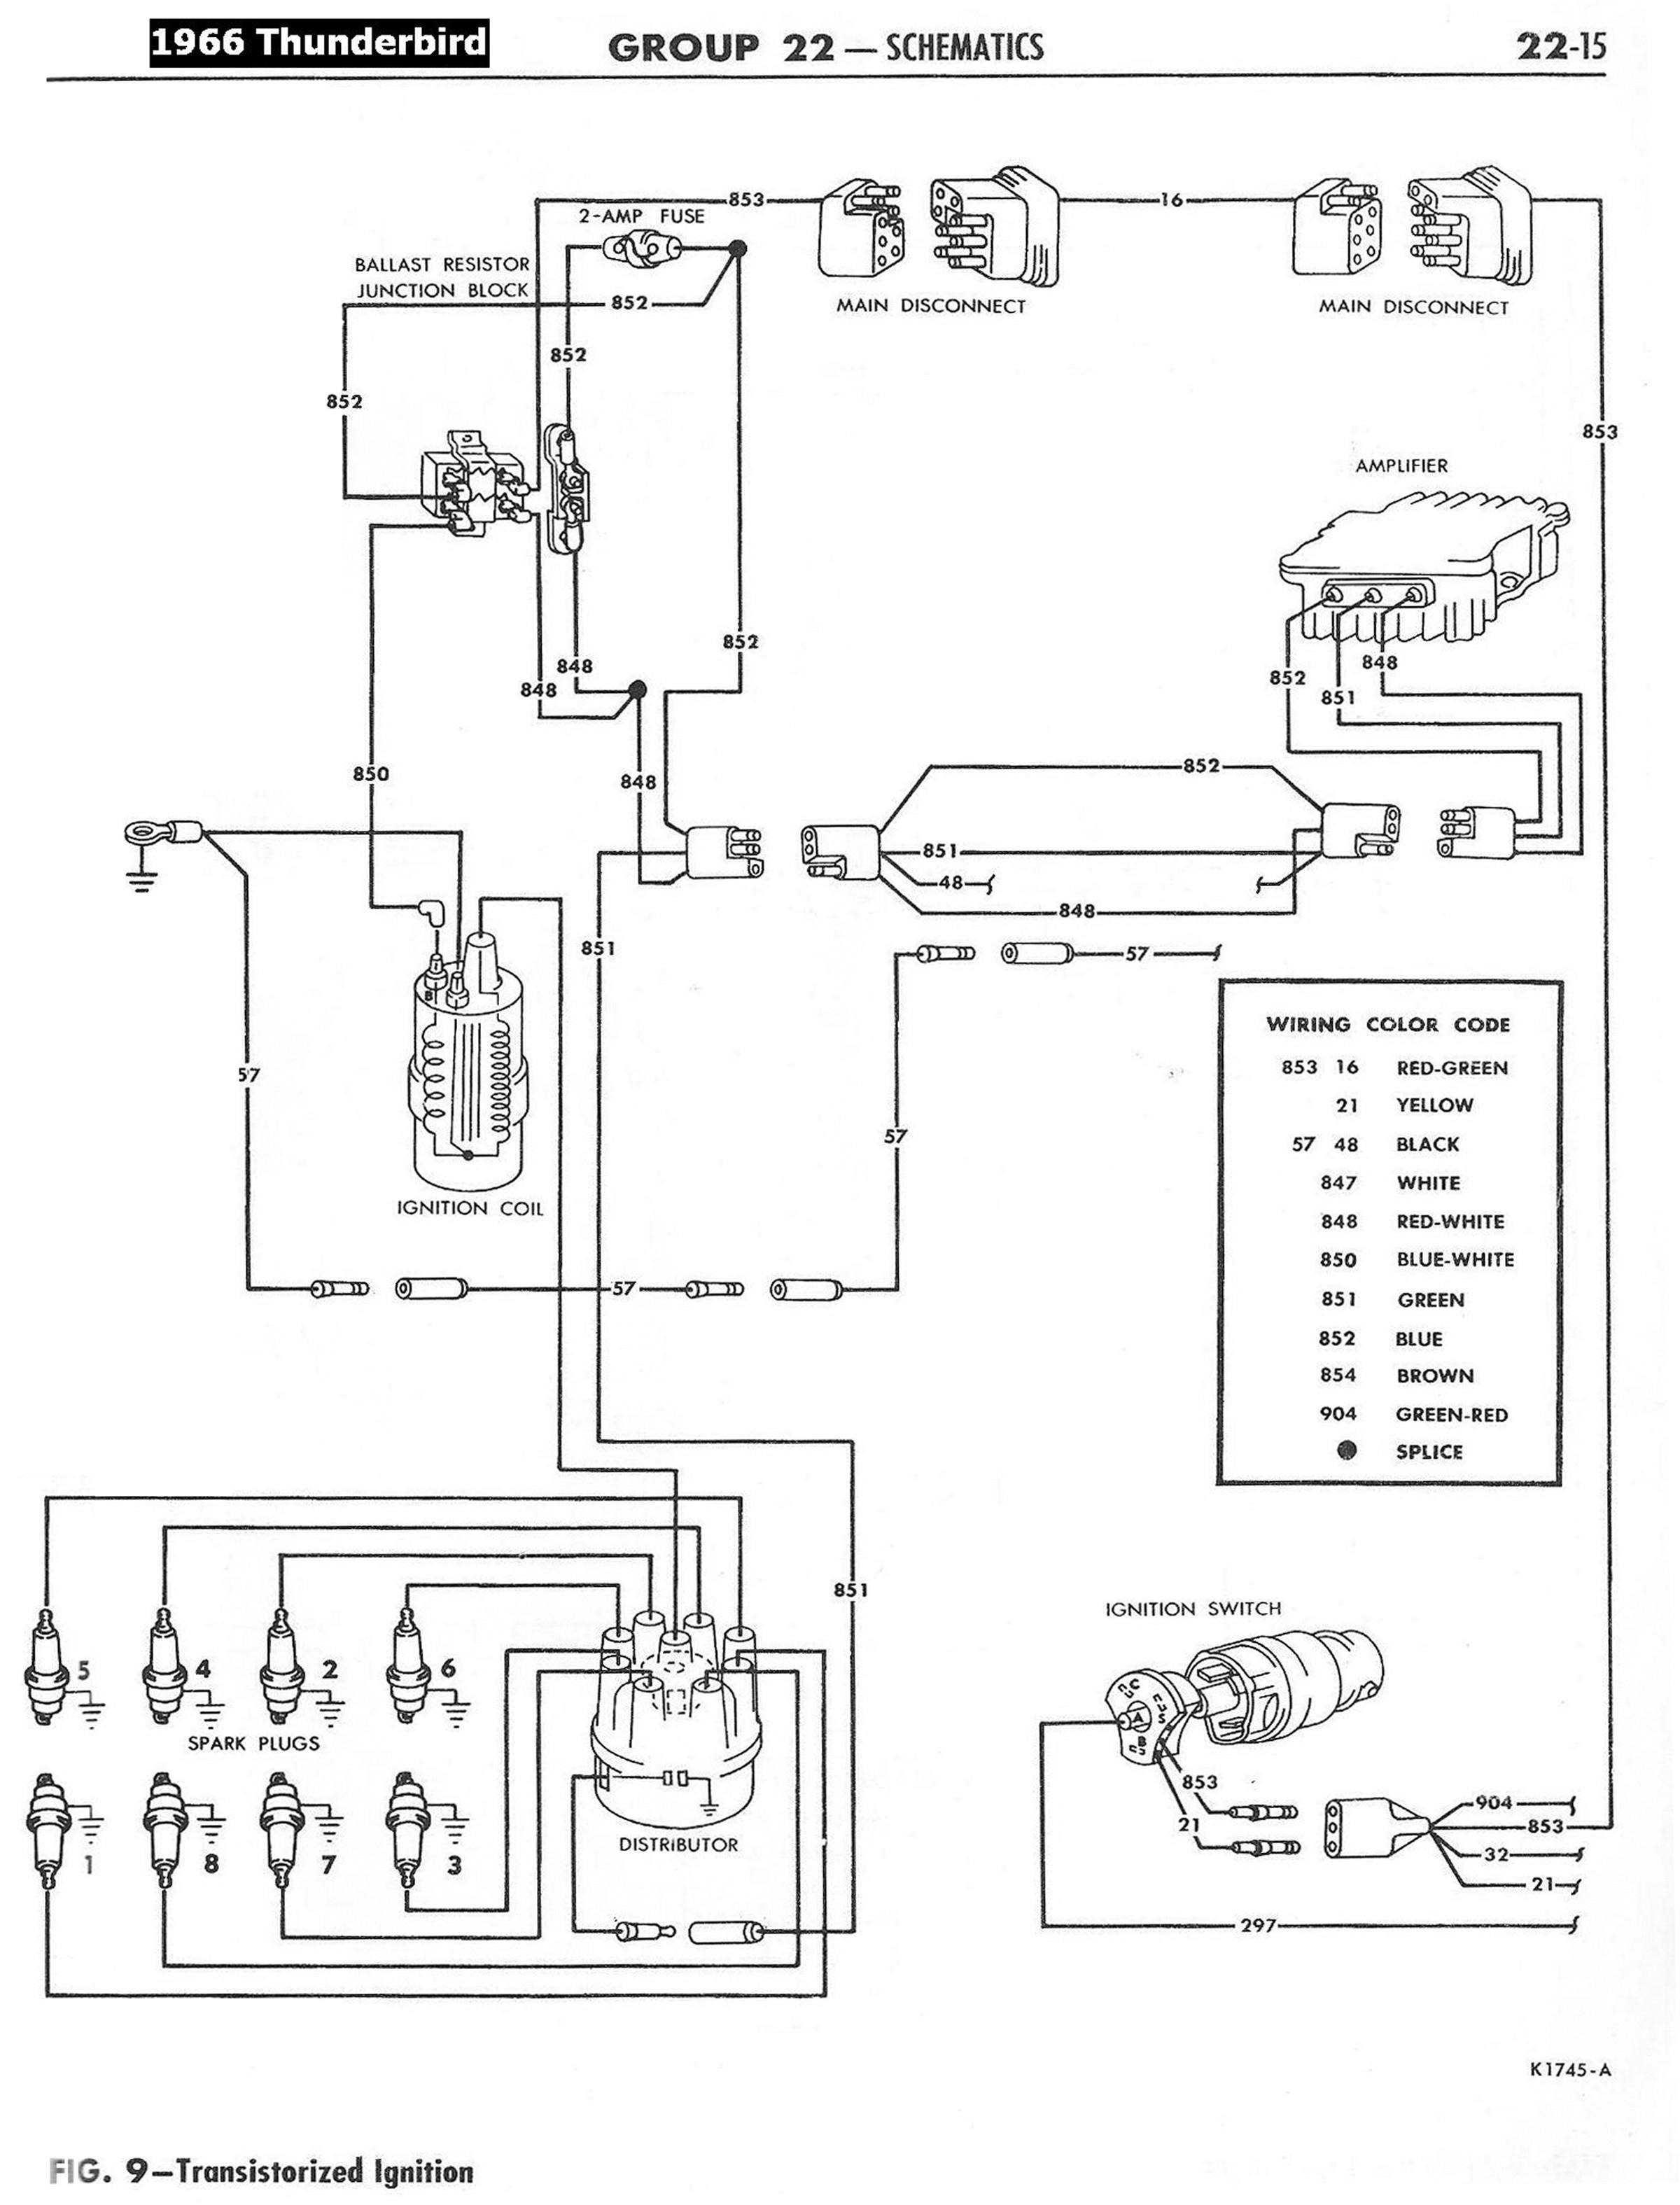 Pertronix Ignition Wiring Diagram - Data Wiring Diagram Schematic - Pertronix Ignitor Wiring Diagram